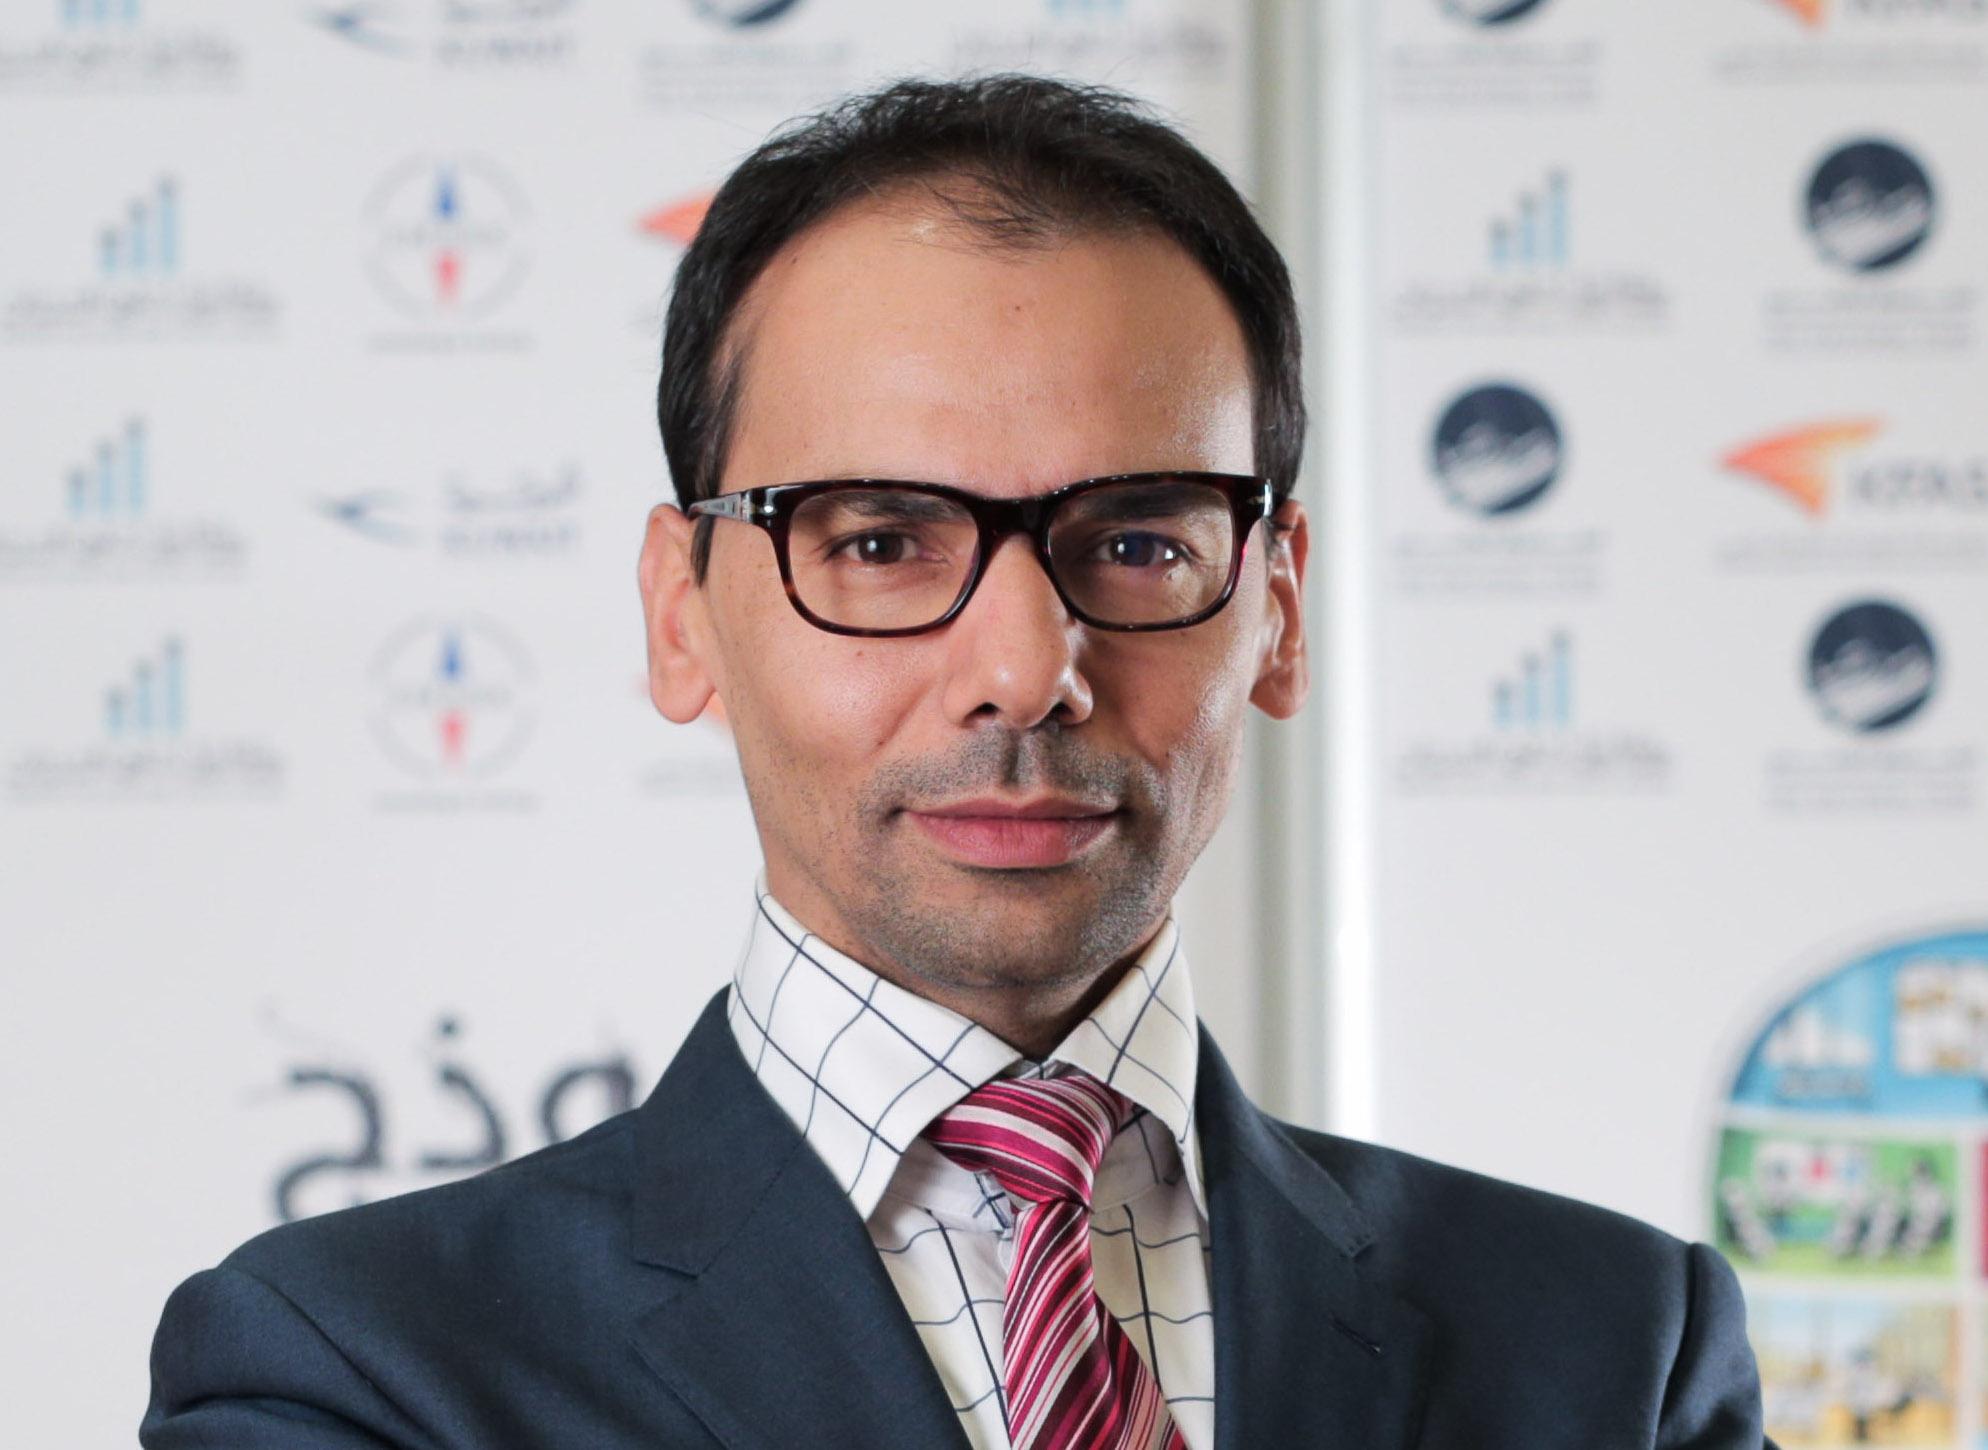 Helal Al-Helal phD